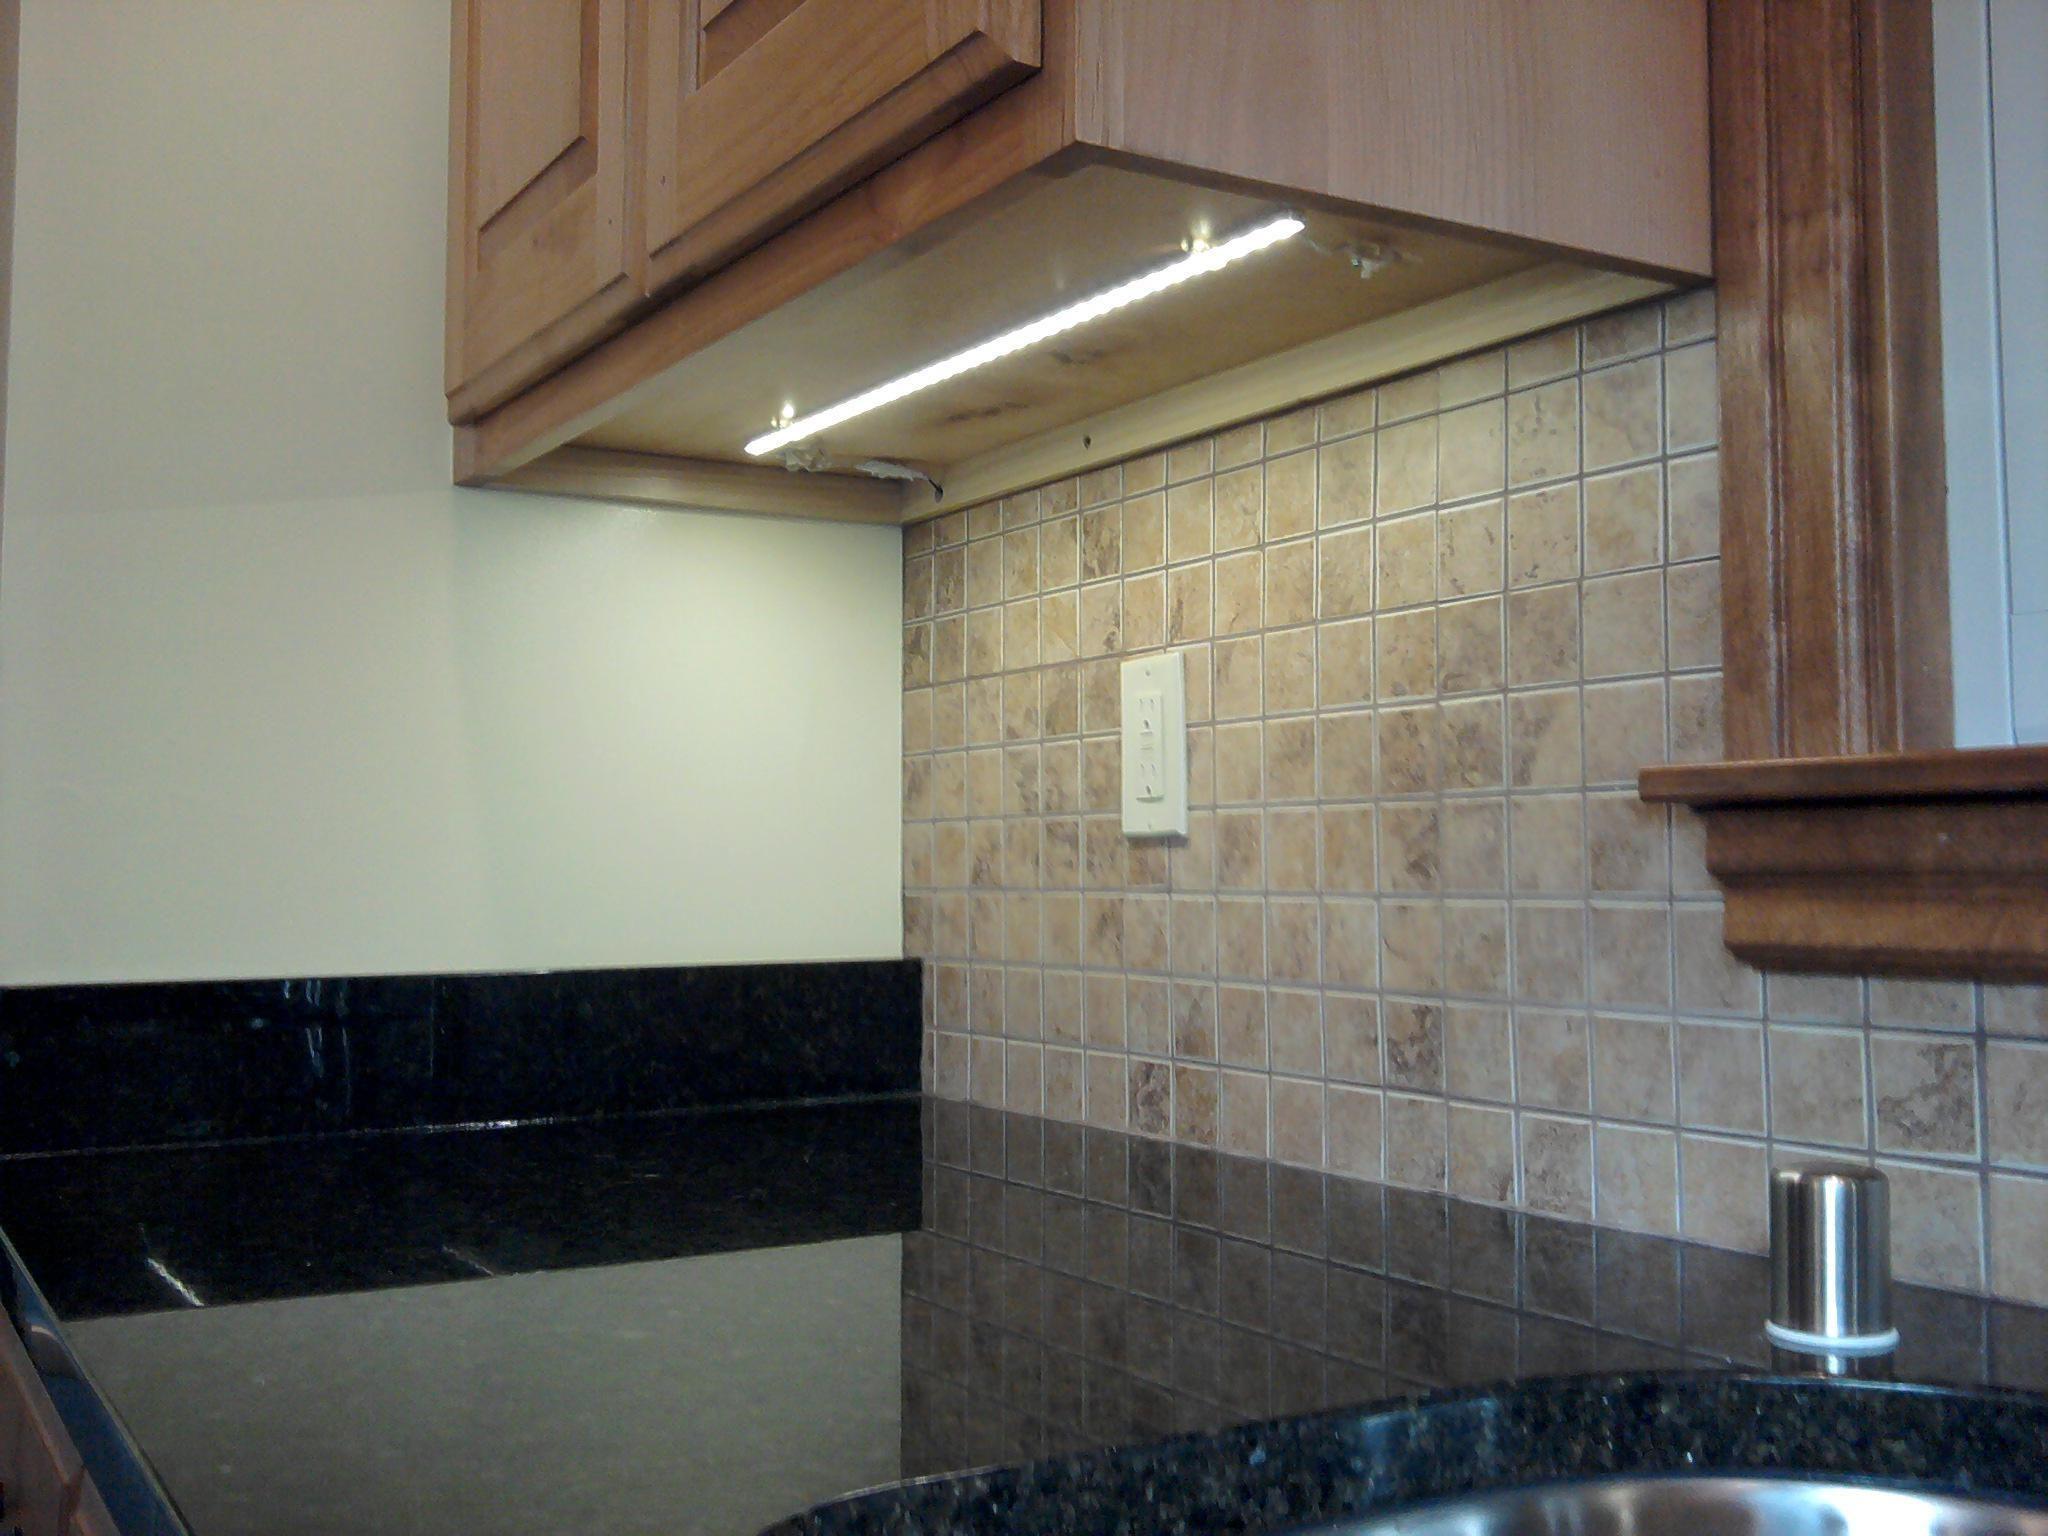 Led Under Cupboard Lighting Kitchen Under Cupboard Lighting Cabinet Lighting Kitchen Under Cabinet Lighting